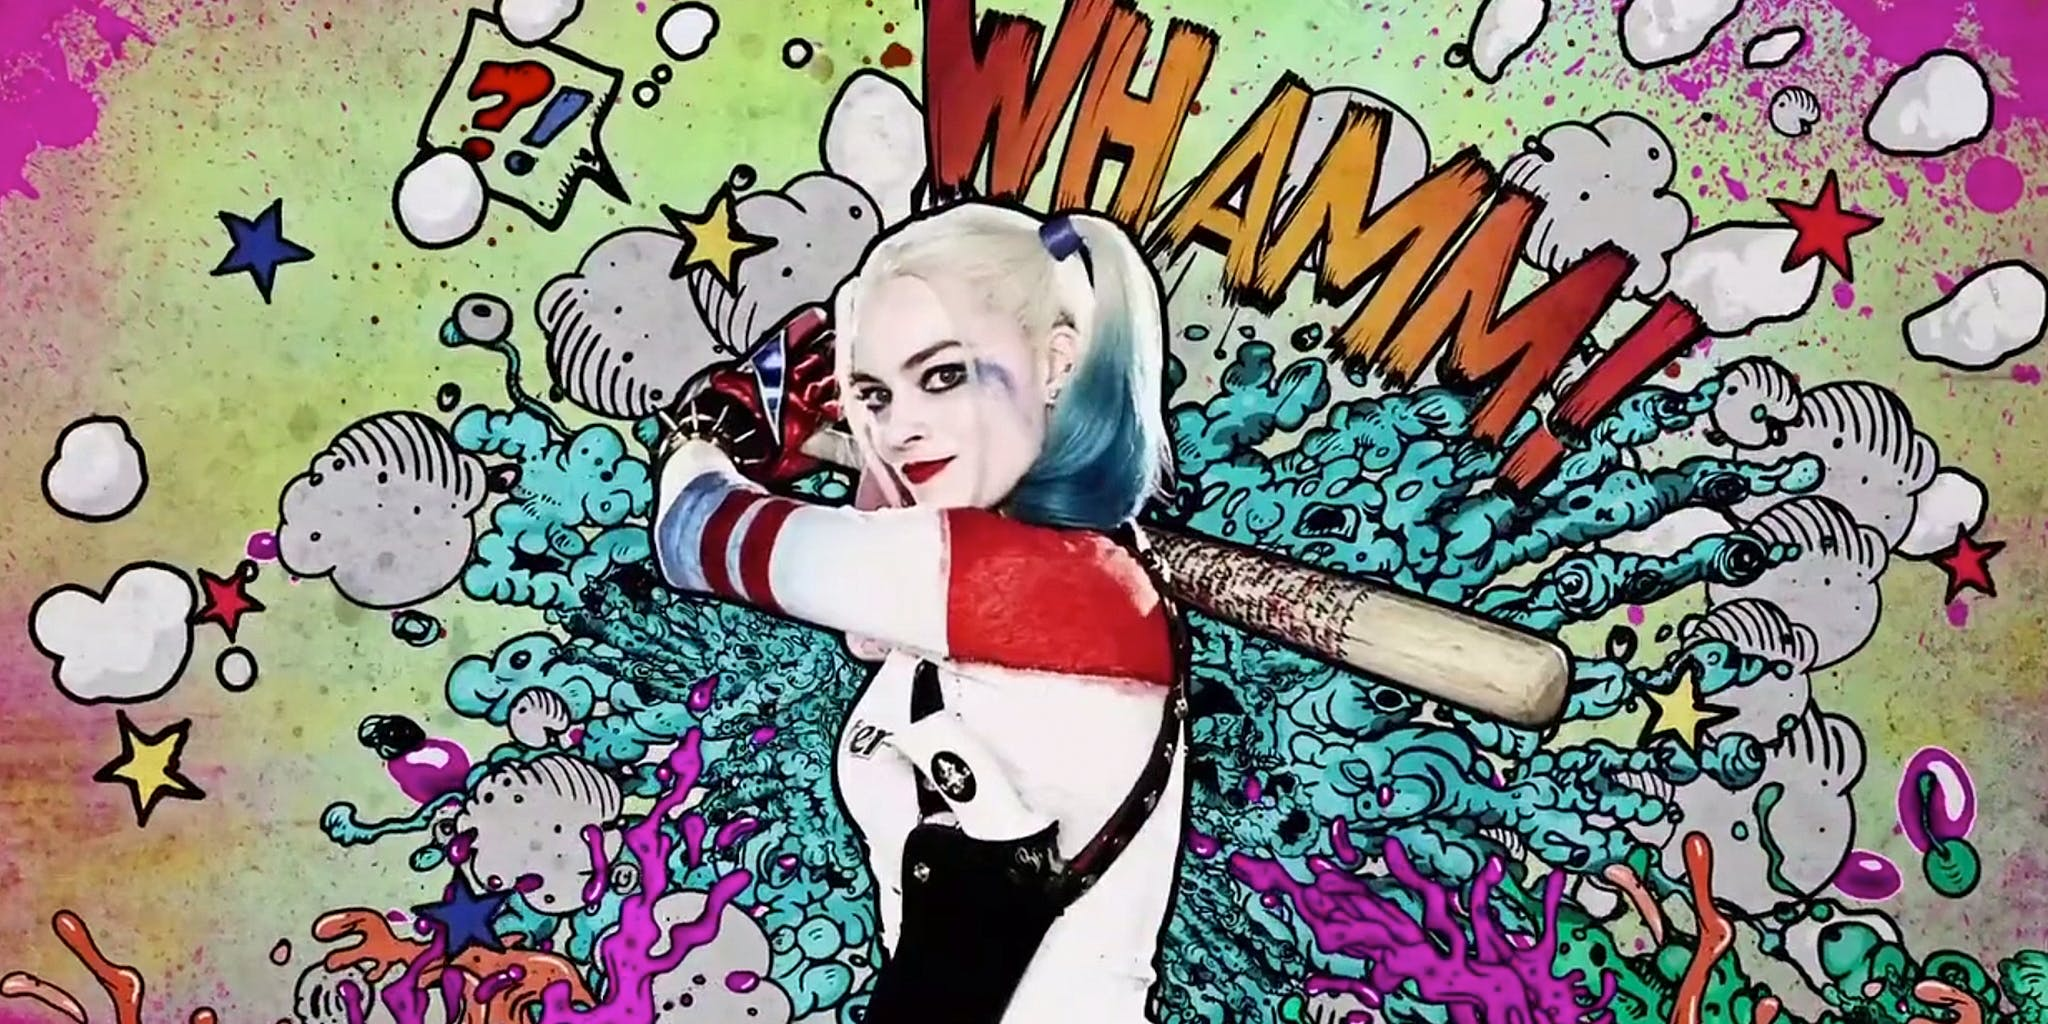 female superheroes - Harley Quinn